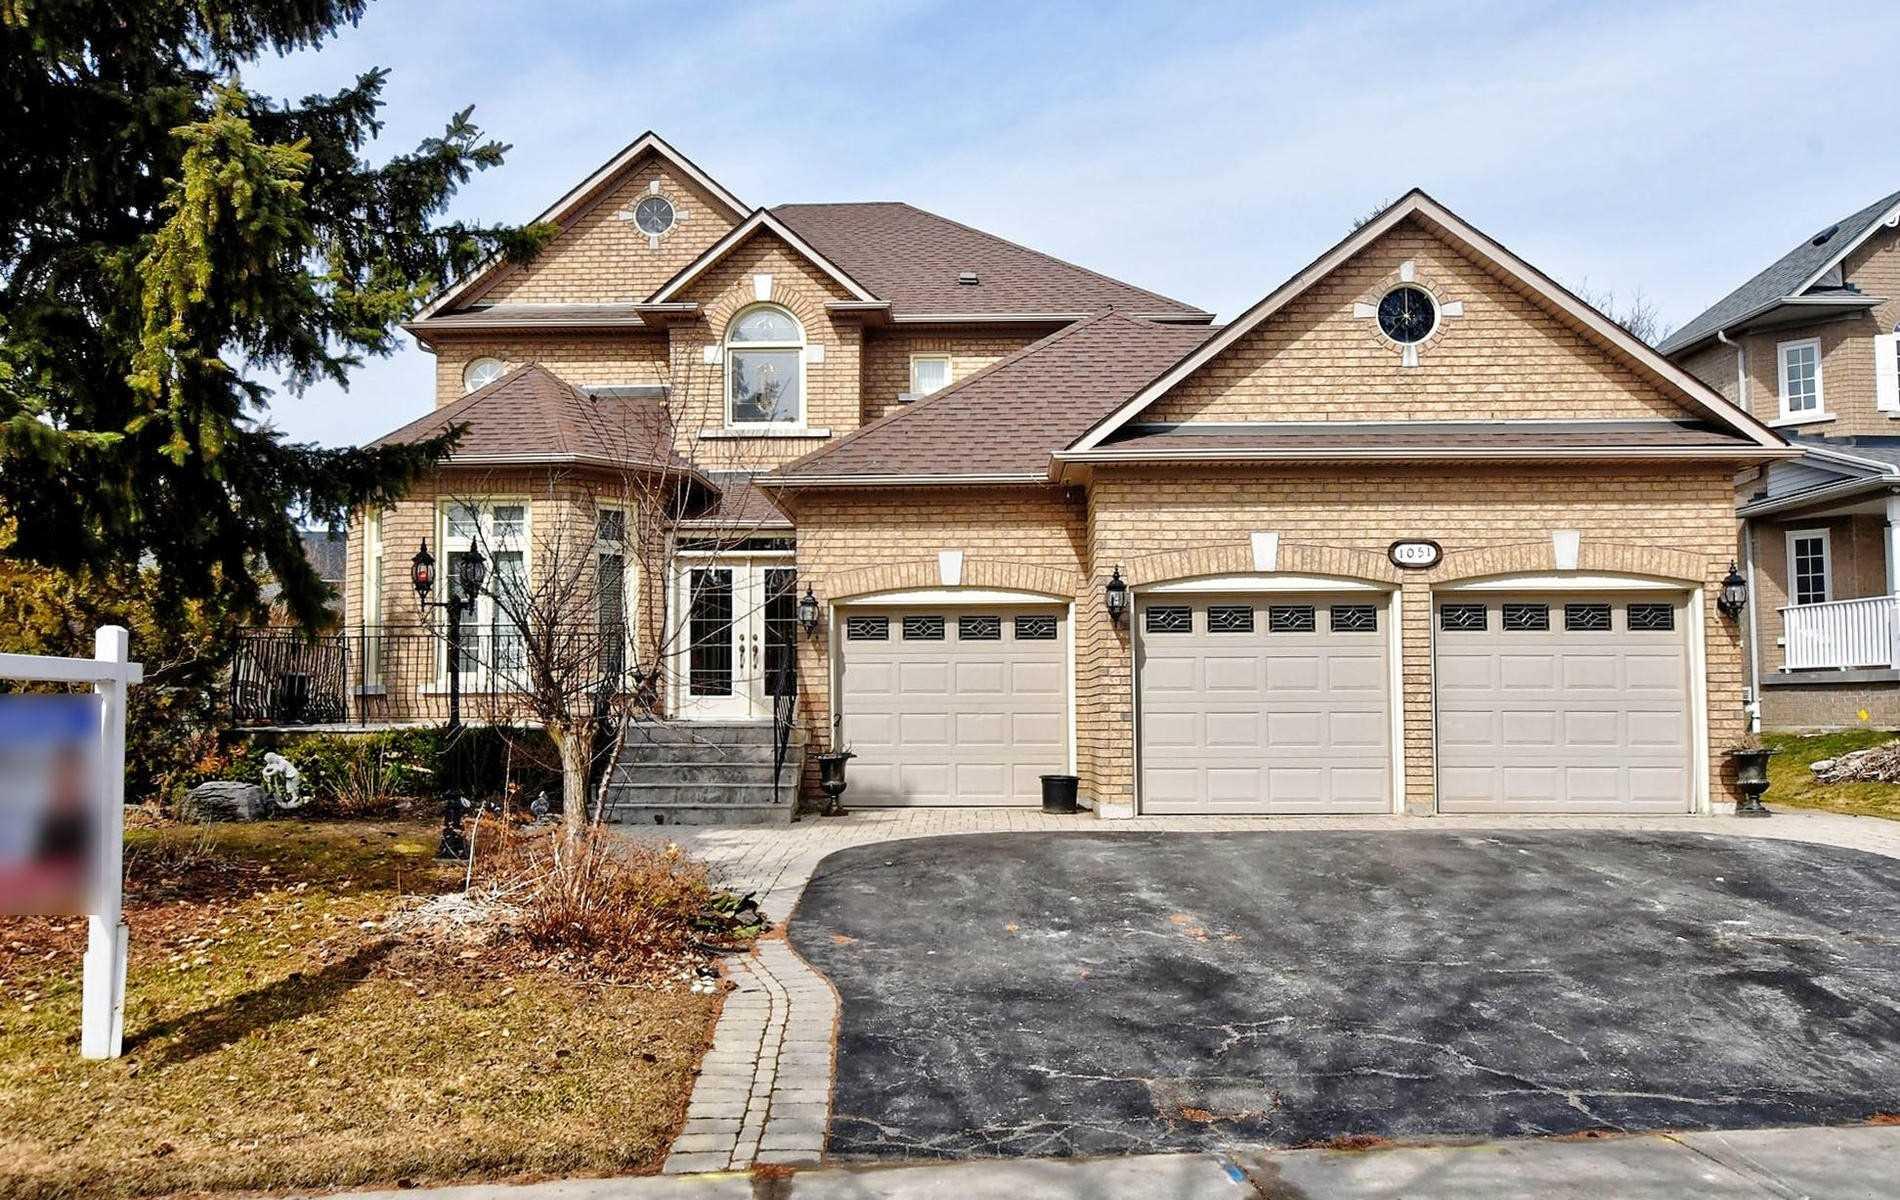 1051 Stonehaven Ave, Newmarket Ontario, Canada